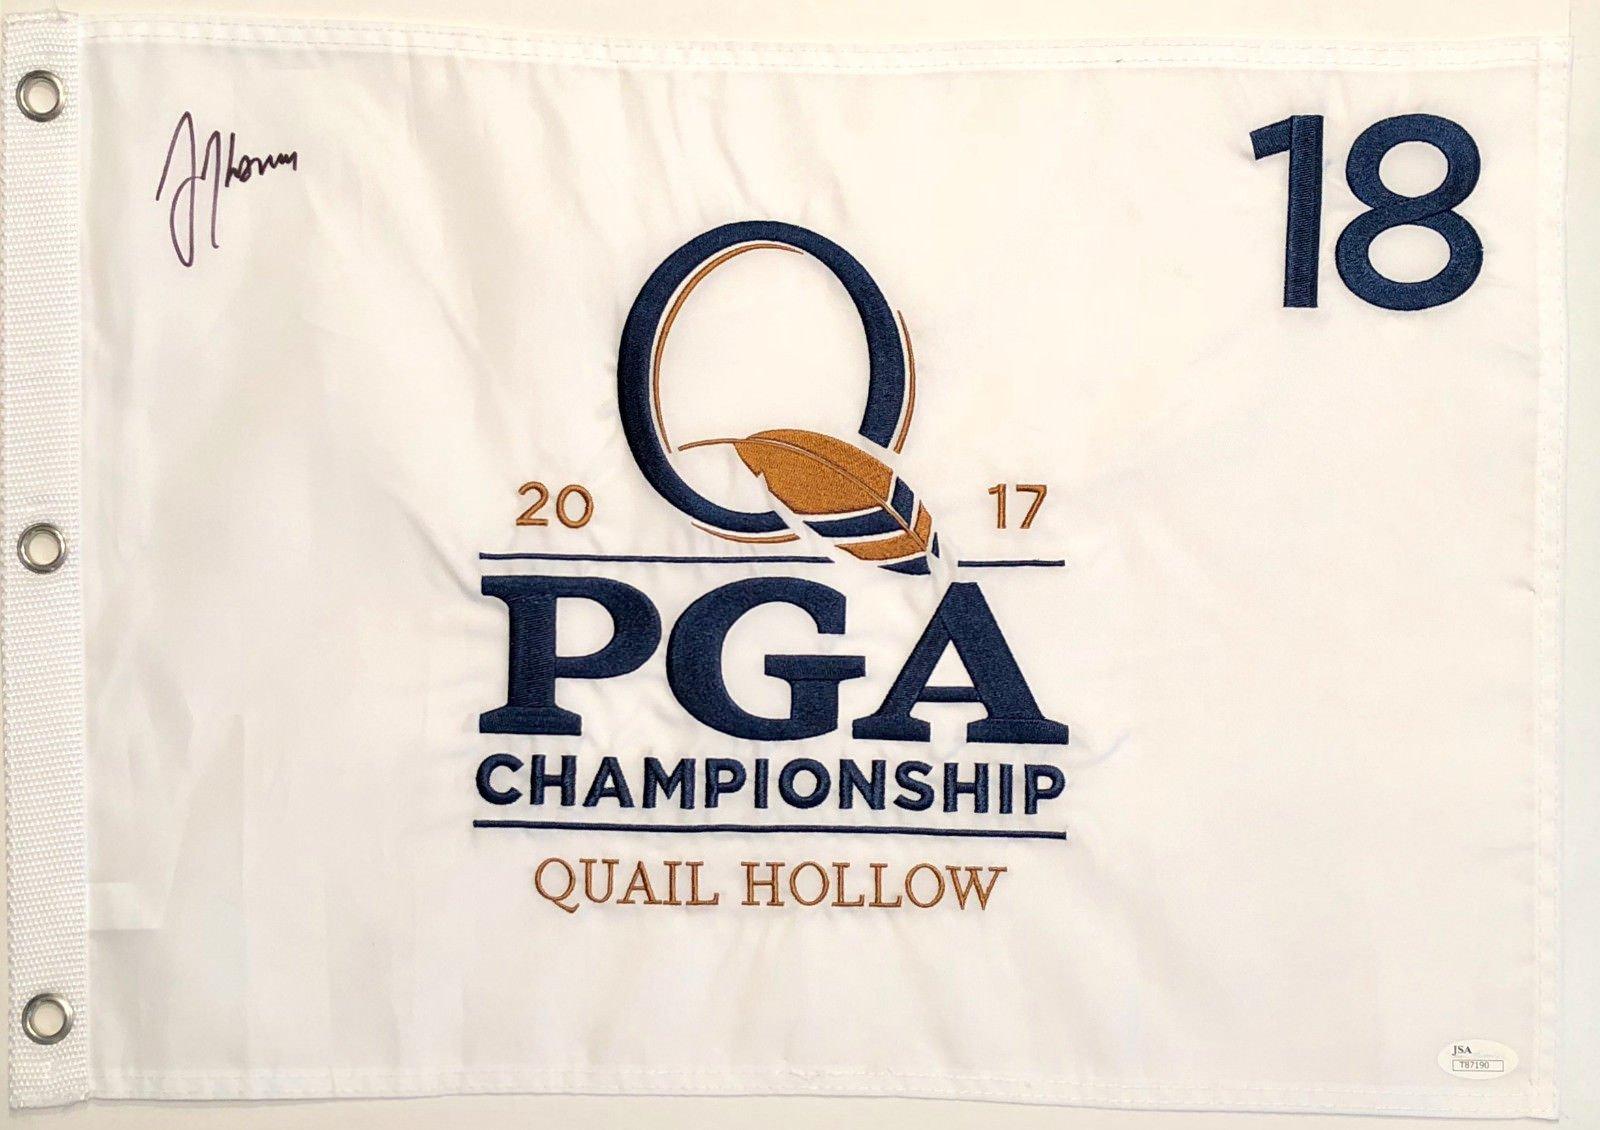 Justin Thomas Signed Autographed 2017 PGA Championship Quail Hollow Flag JSA